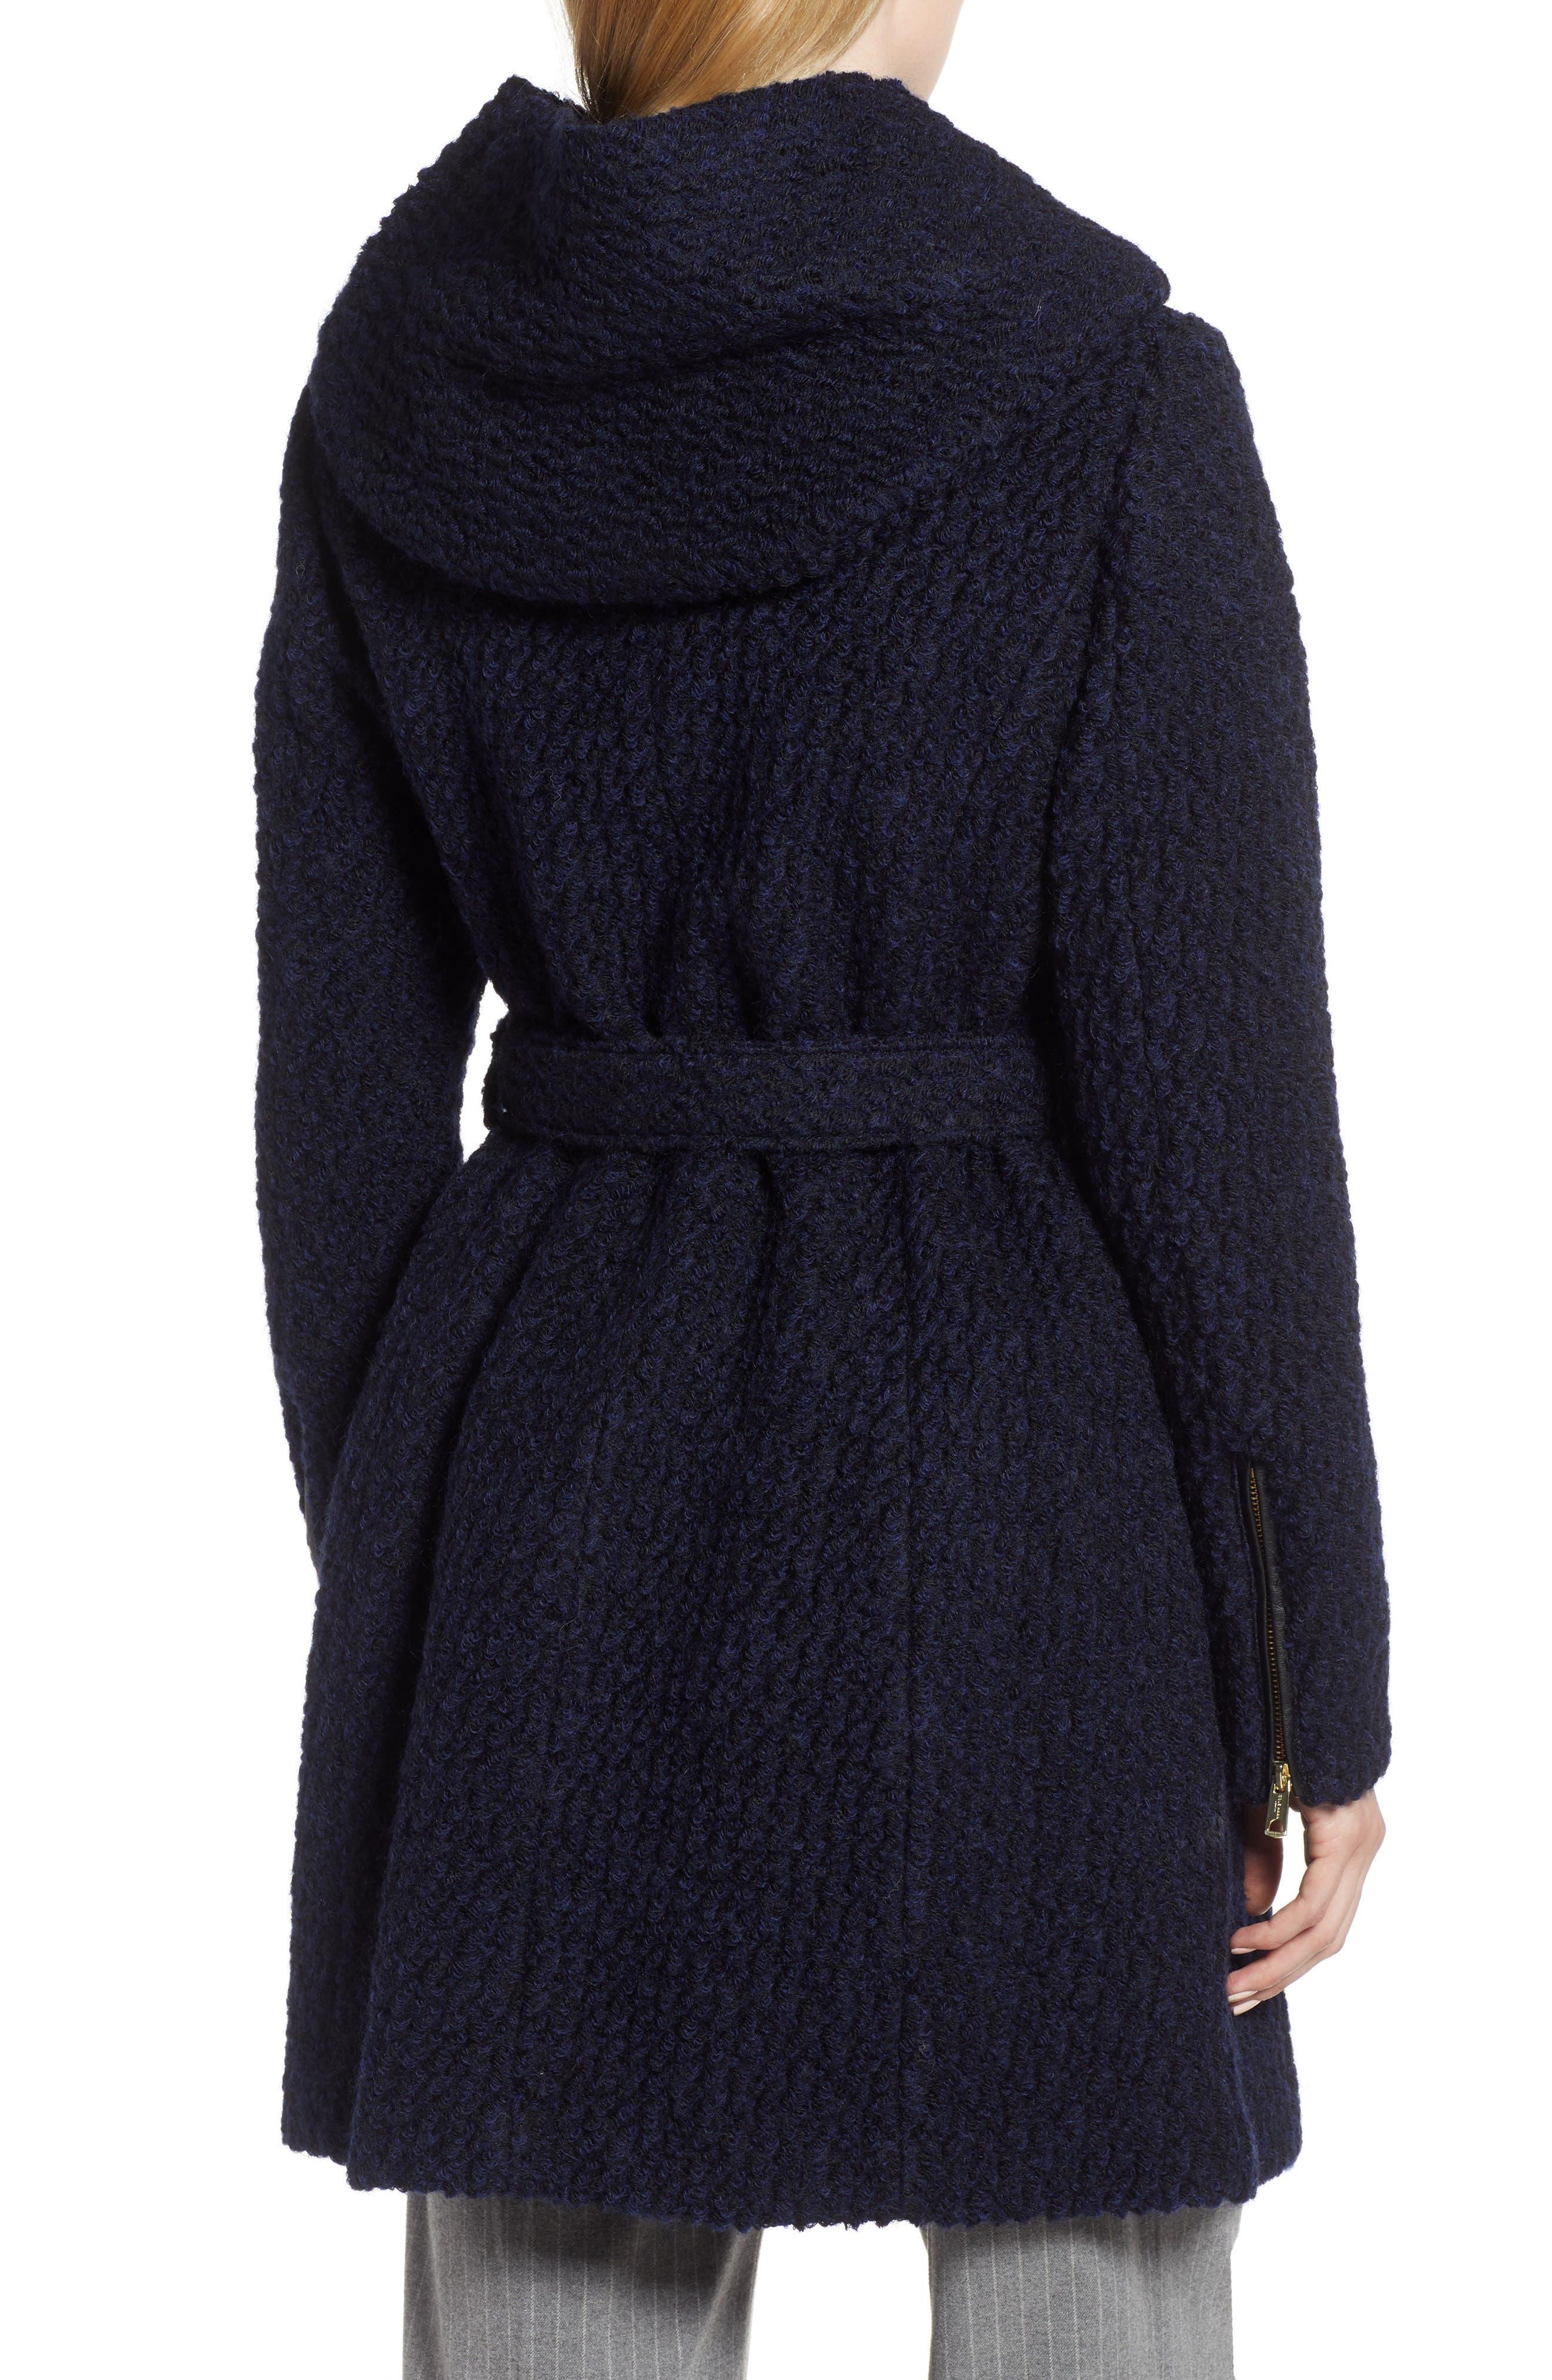 Belted Bouclé Wool Blend Coat,                             Alternate thumbnail 2, color,                             BLACK/ NAVY